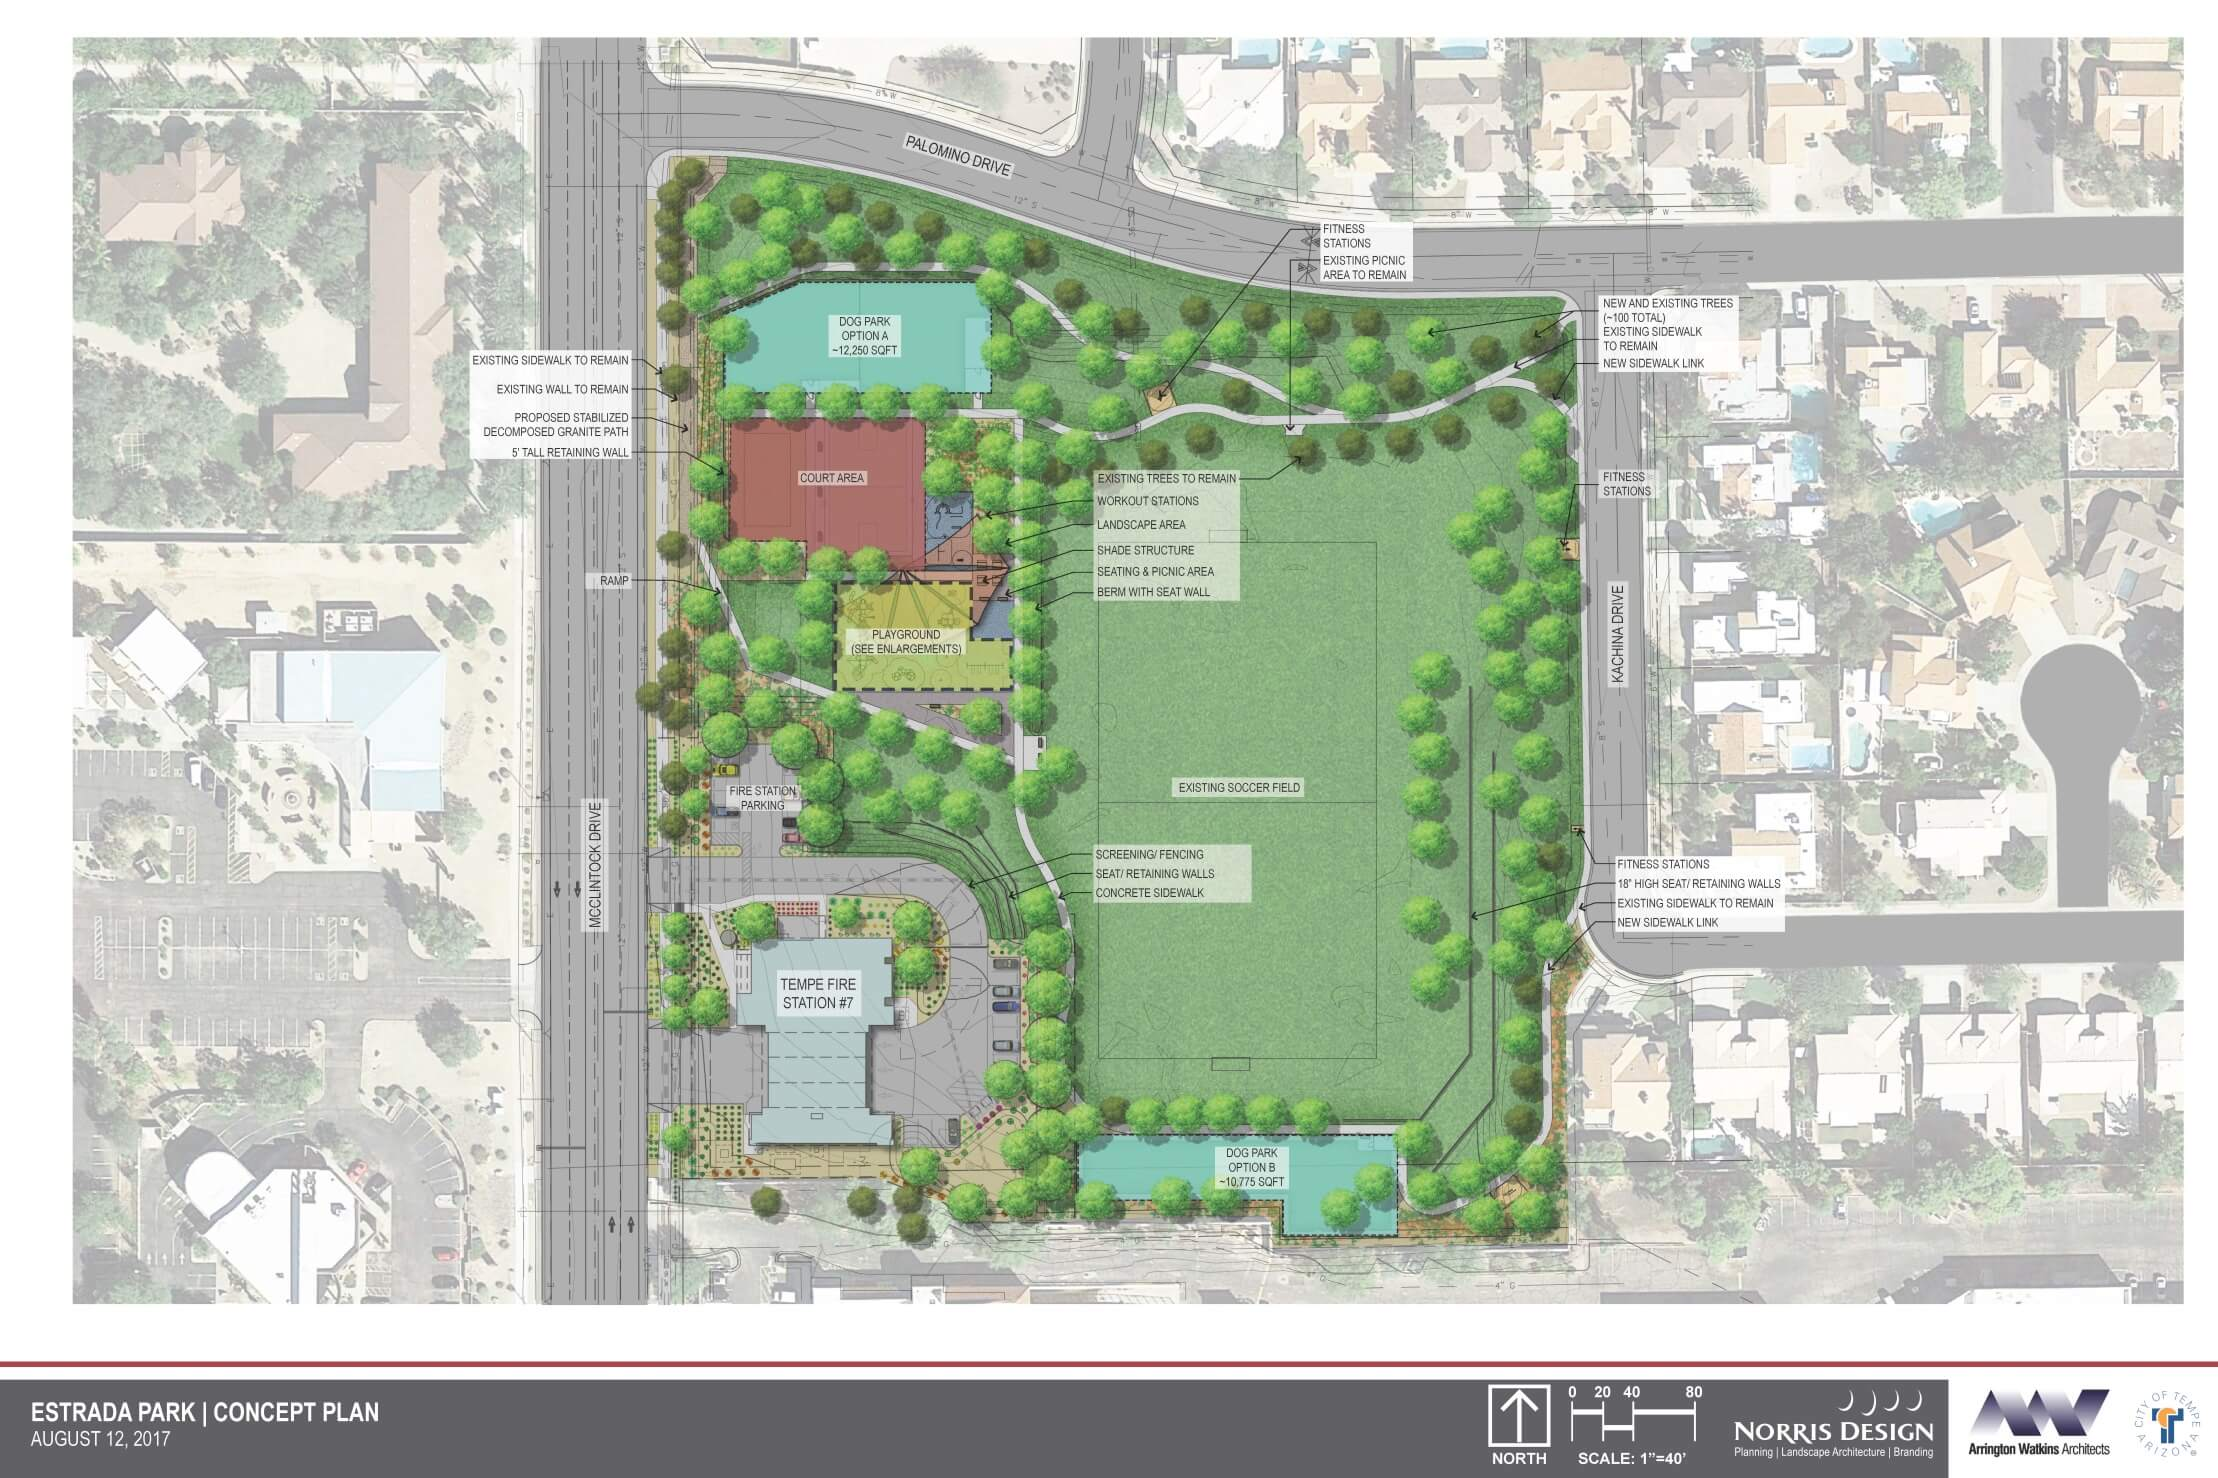 Estrada Park Public Art Opportunity Plan